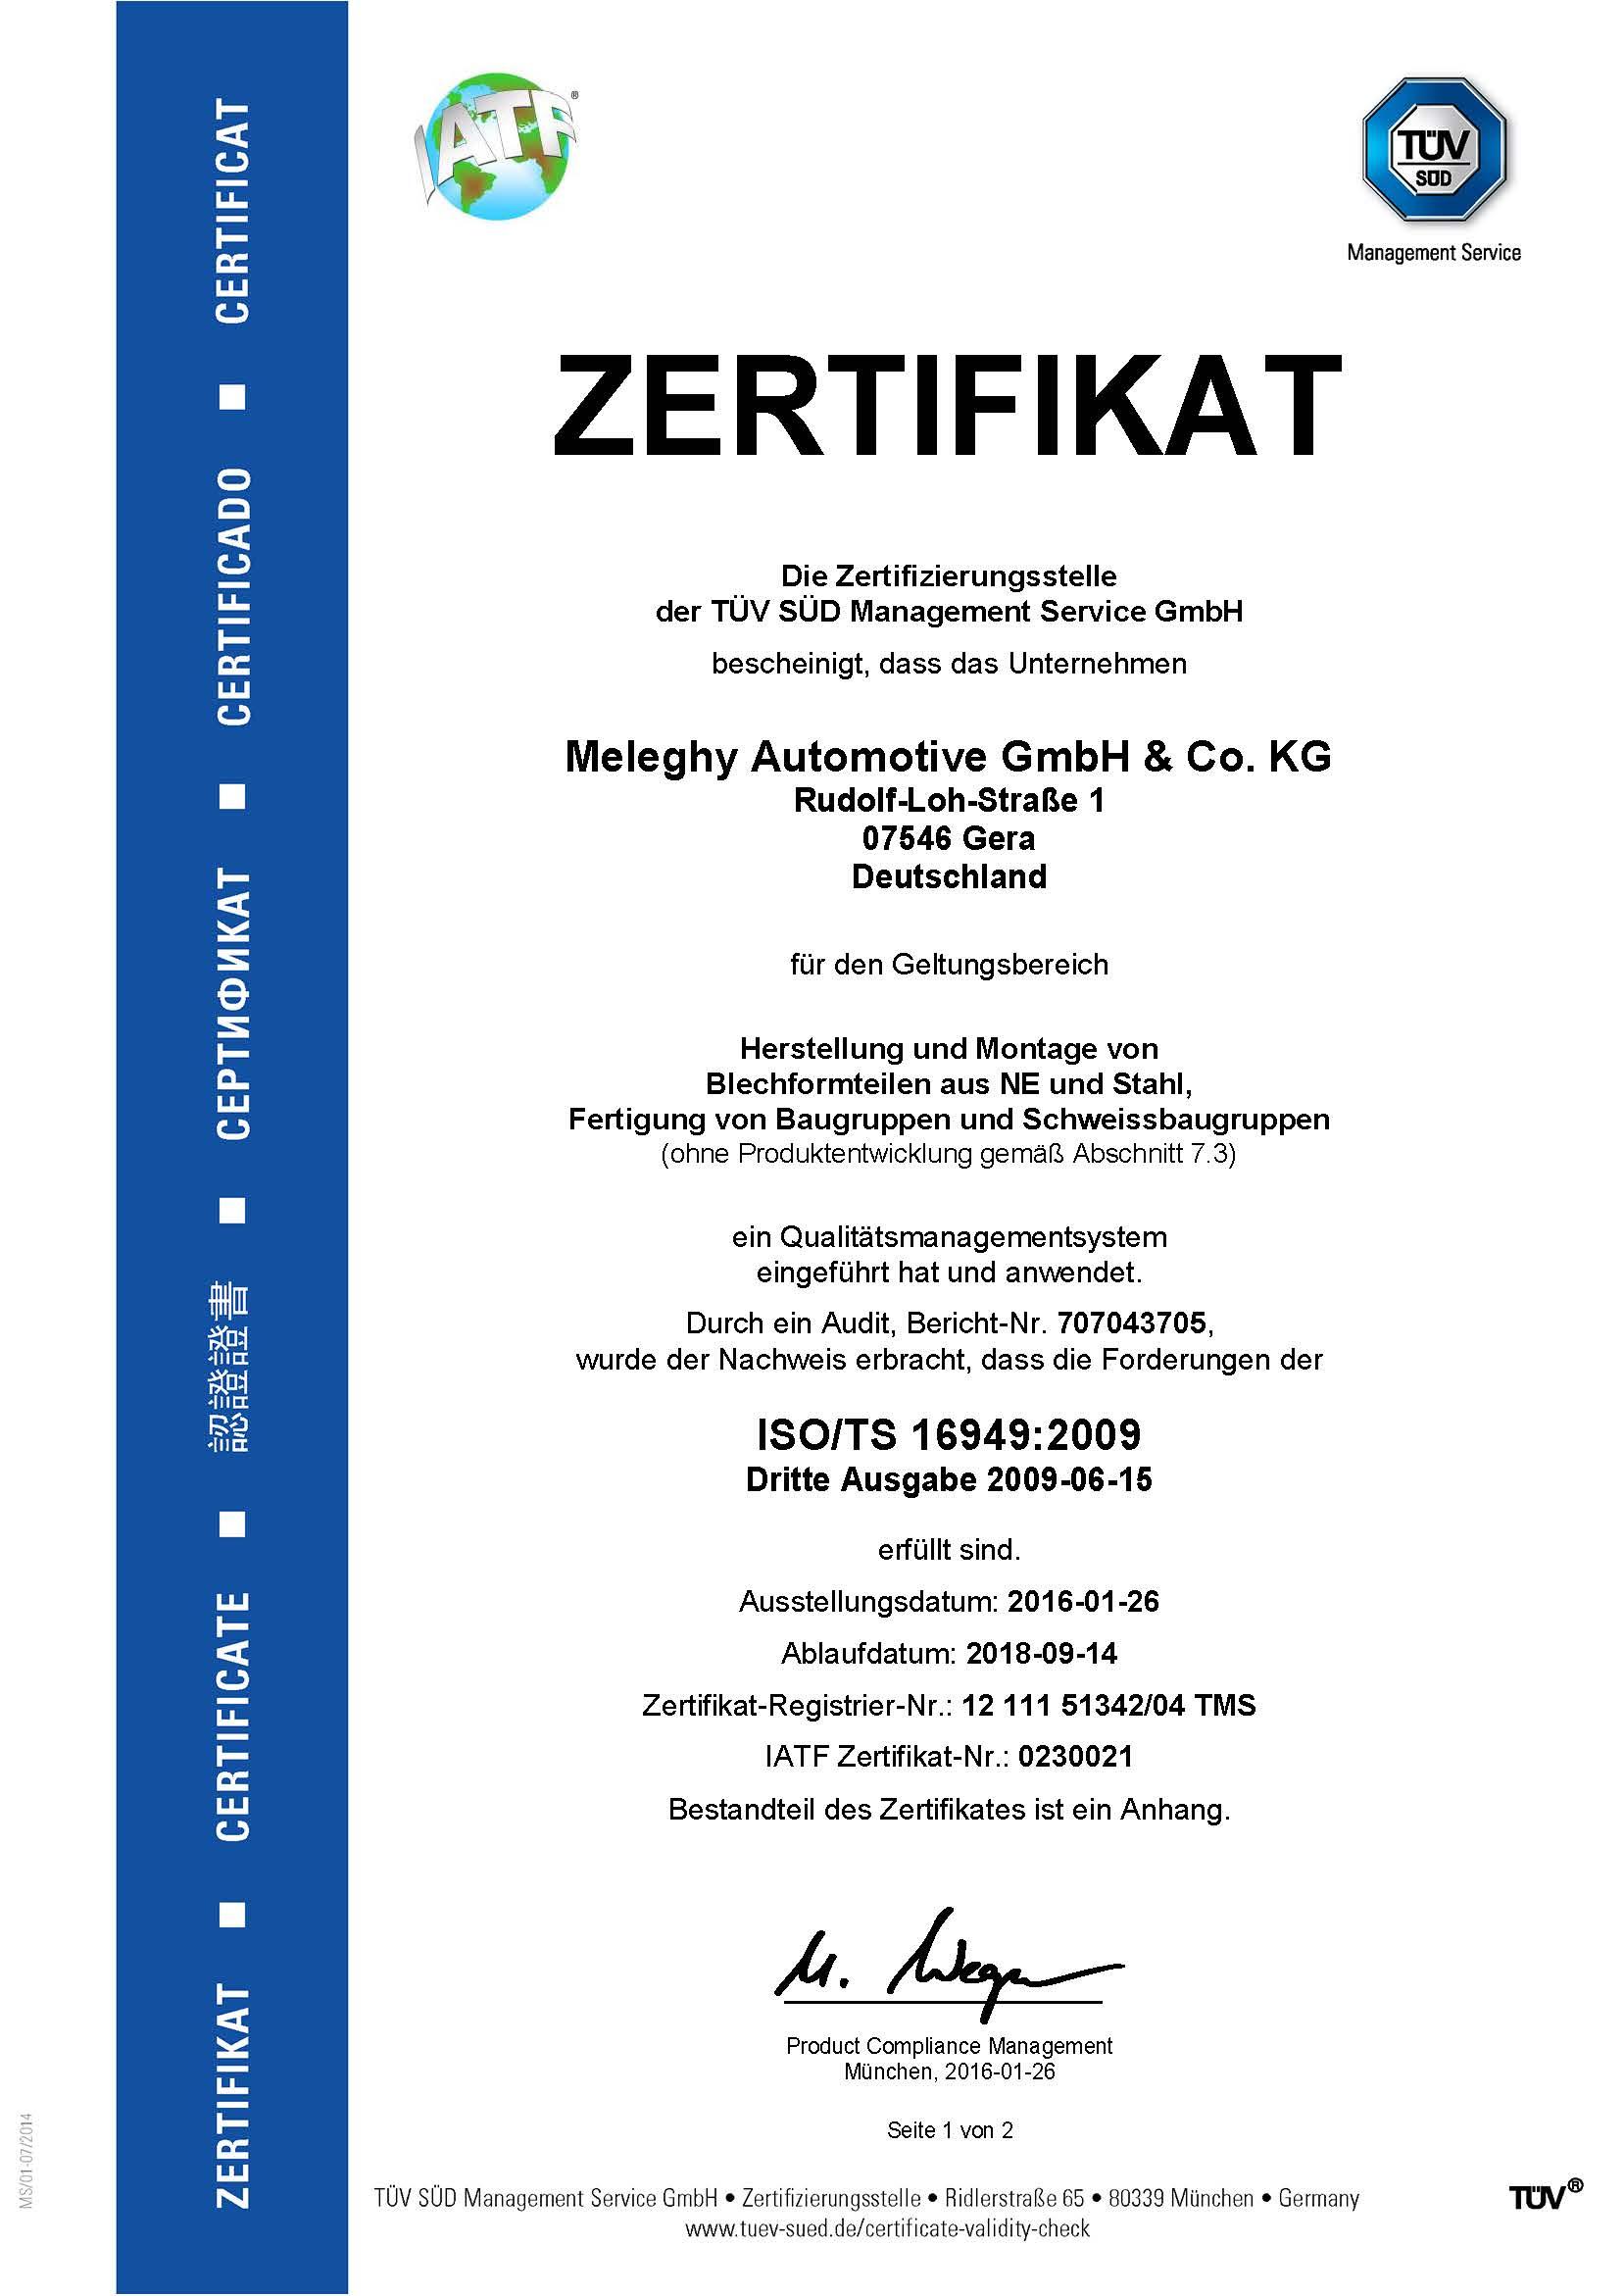 Meleghy Automotive Gera Zertifikat ISO_TS 16949_de